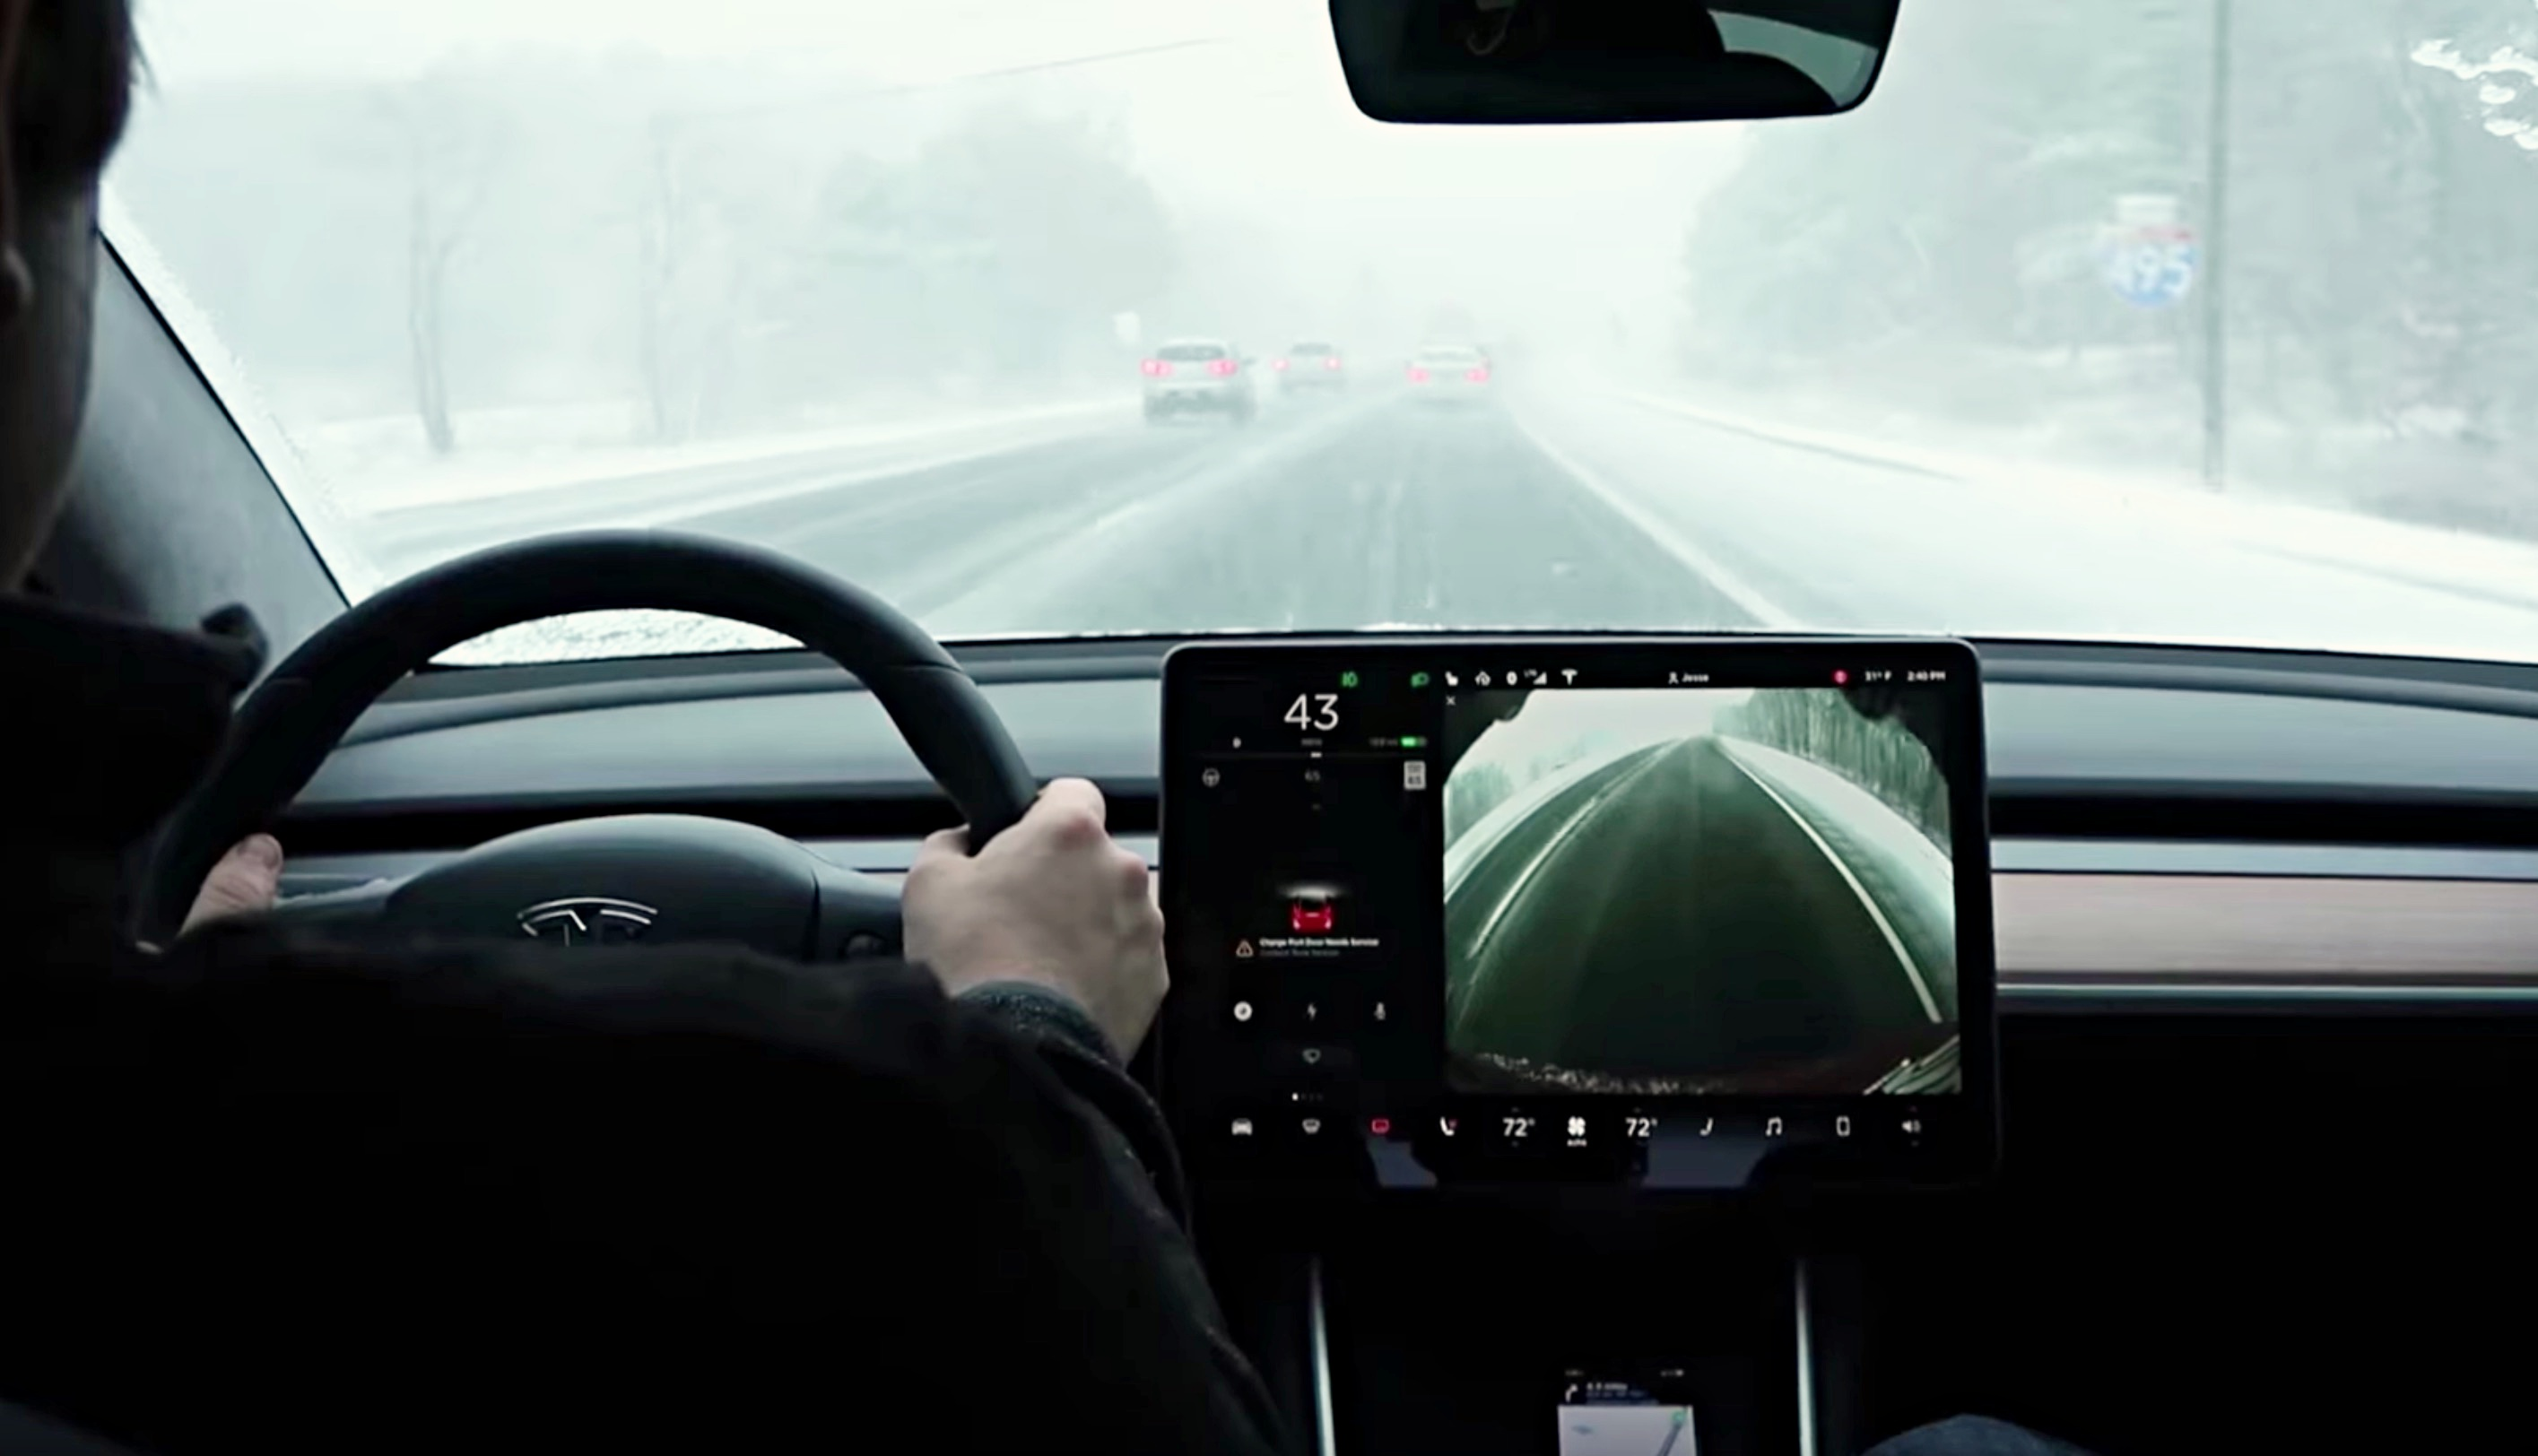 Best Look Yet At Tesla Model 3 Handling Snowy Conditions On Standard Tires